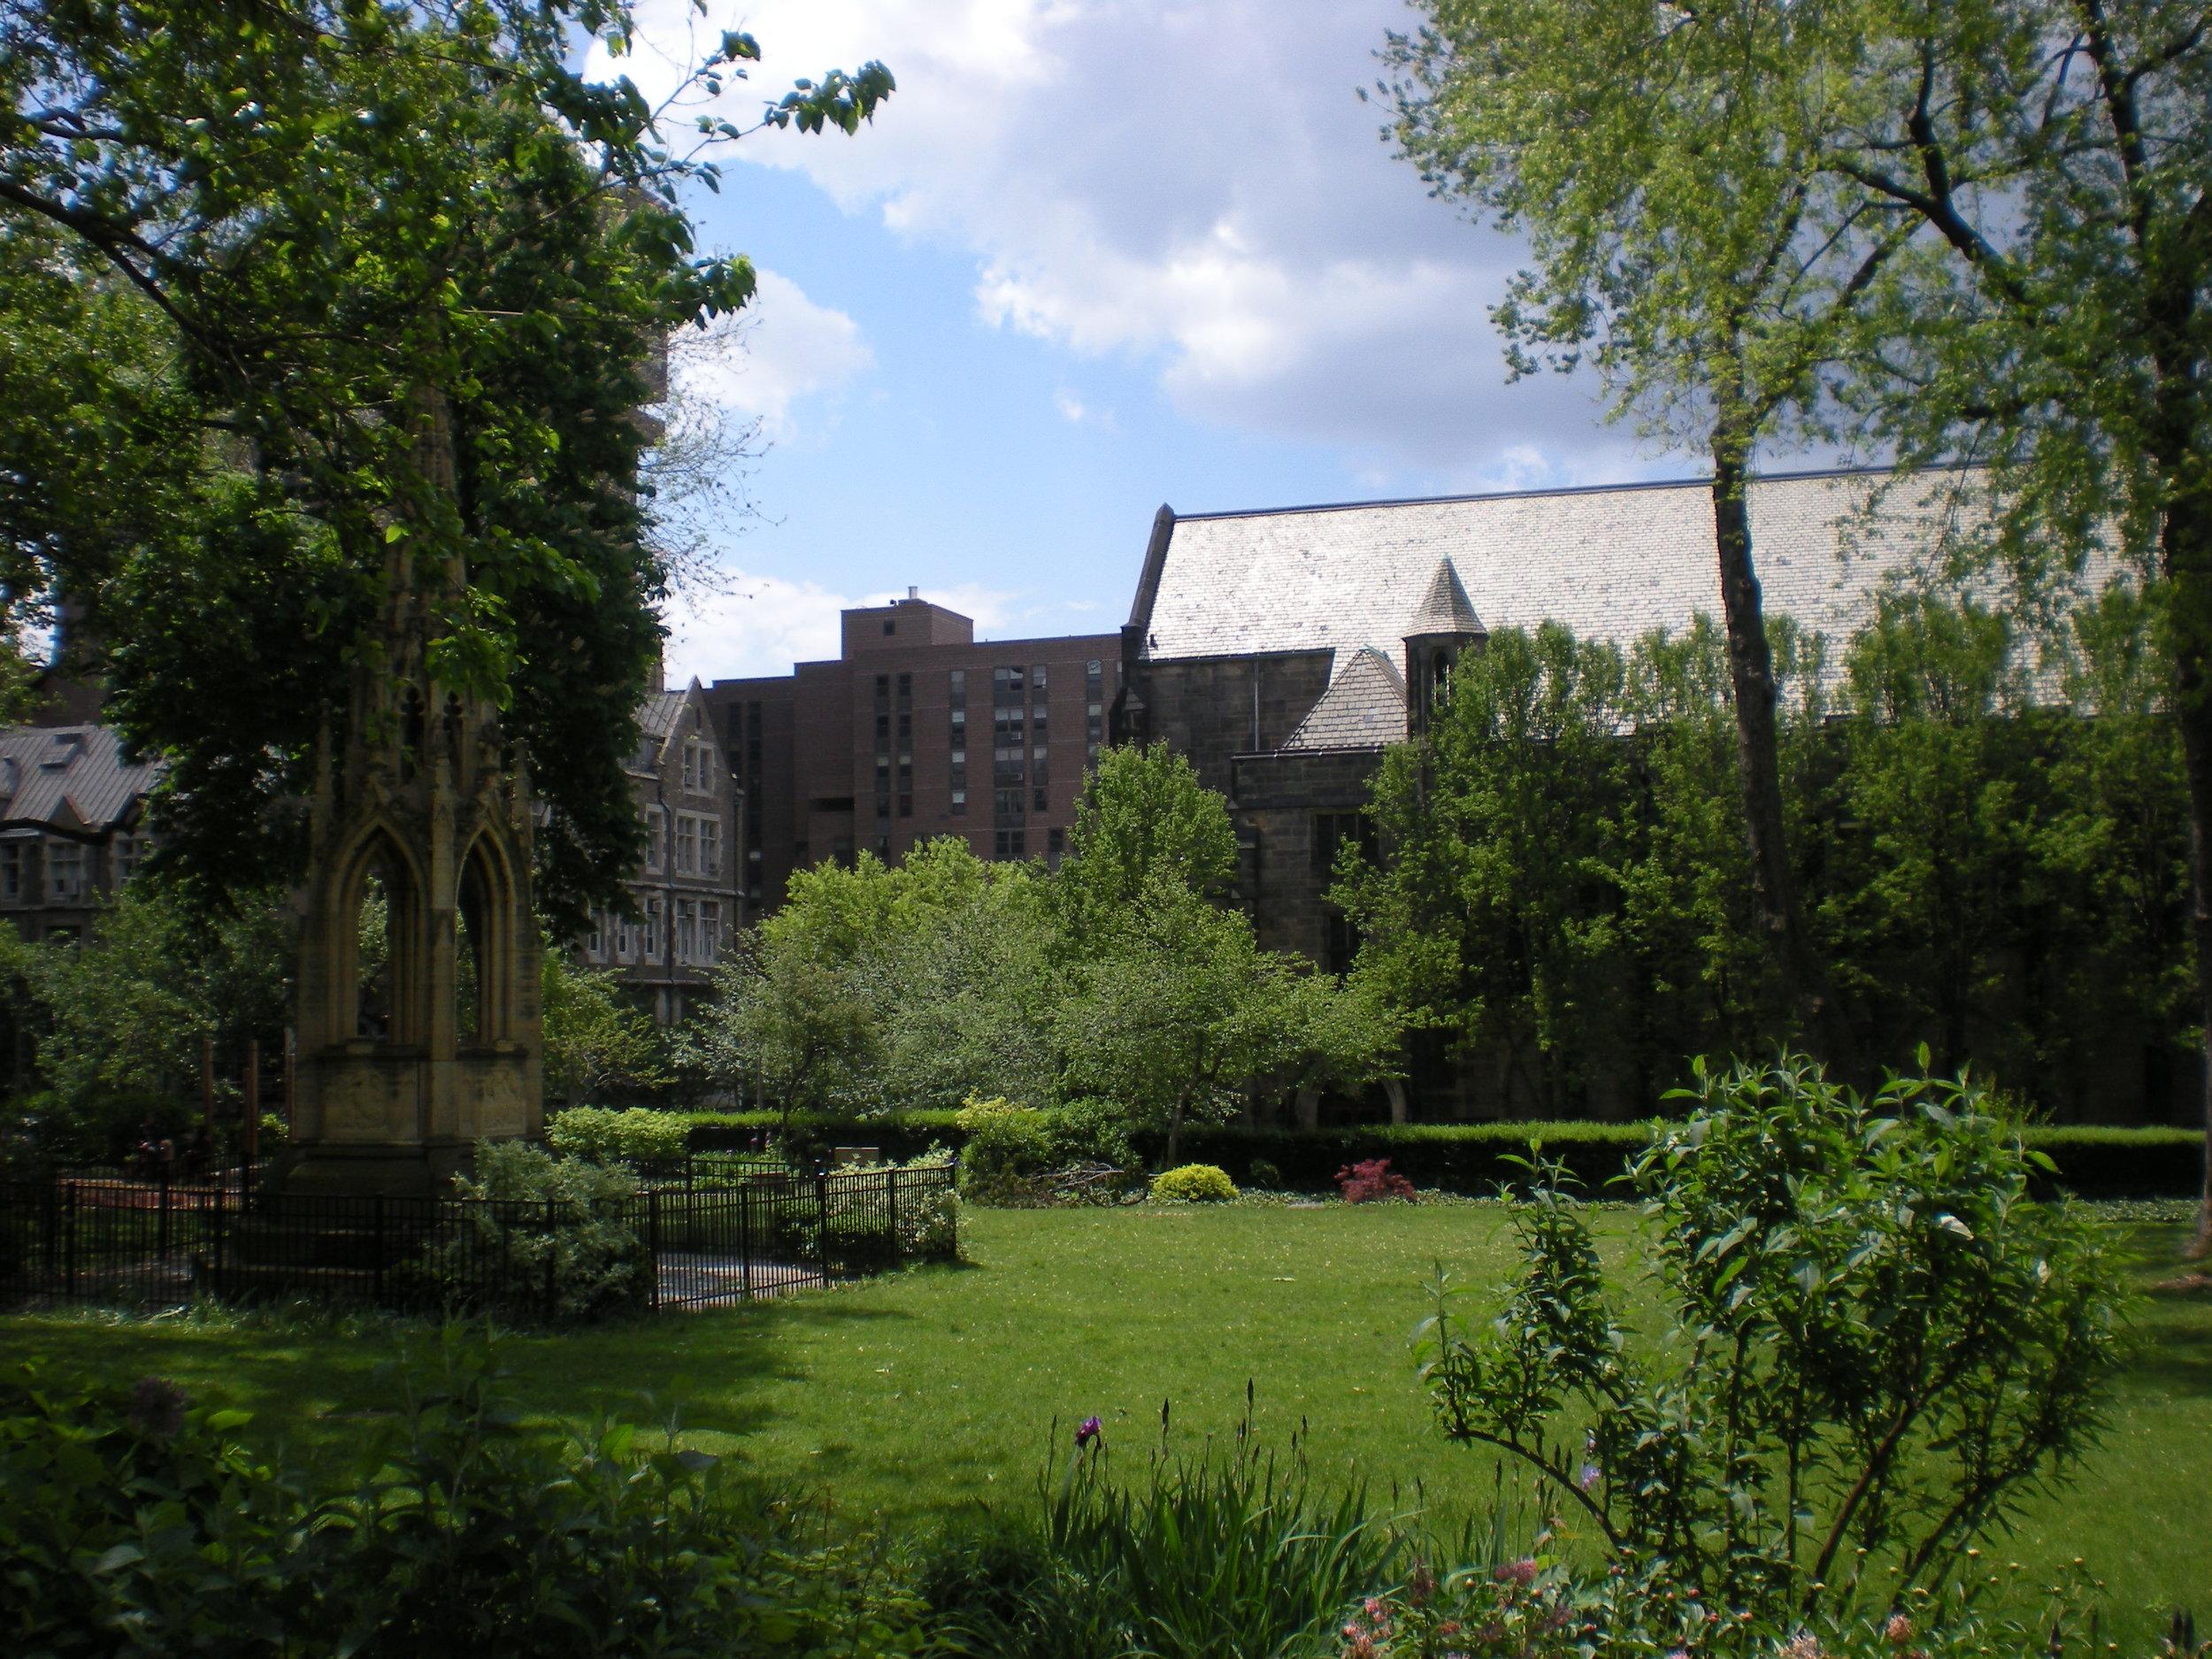 Cathedral+garden+3.jpeg